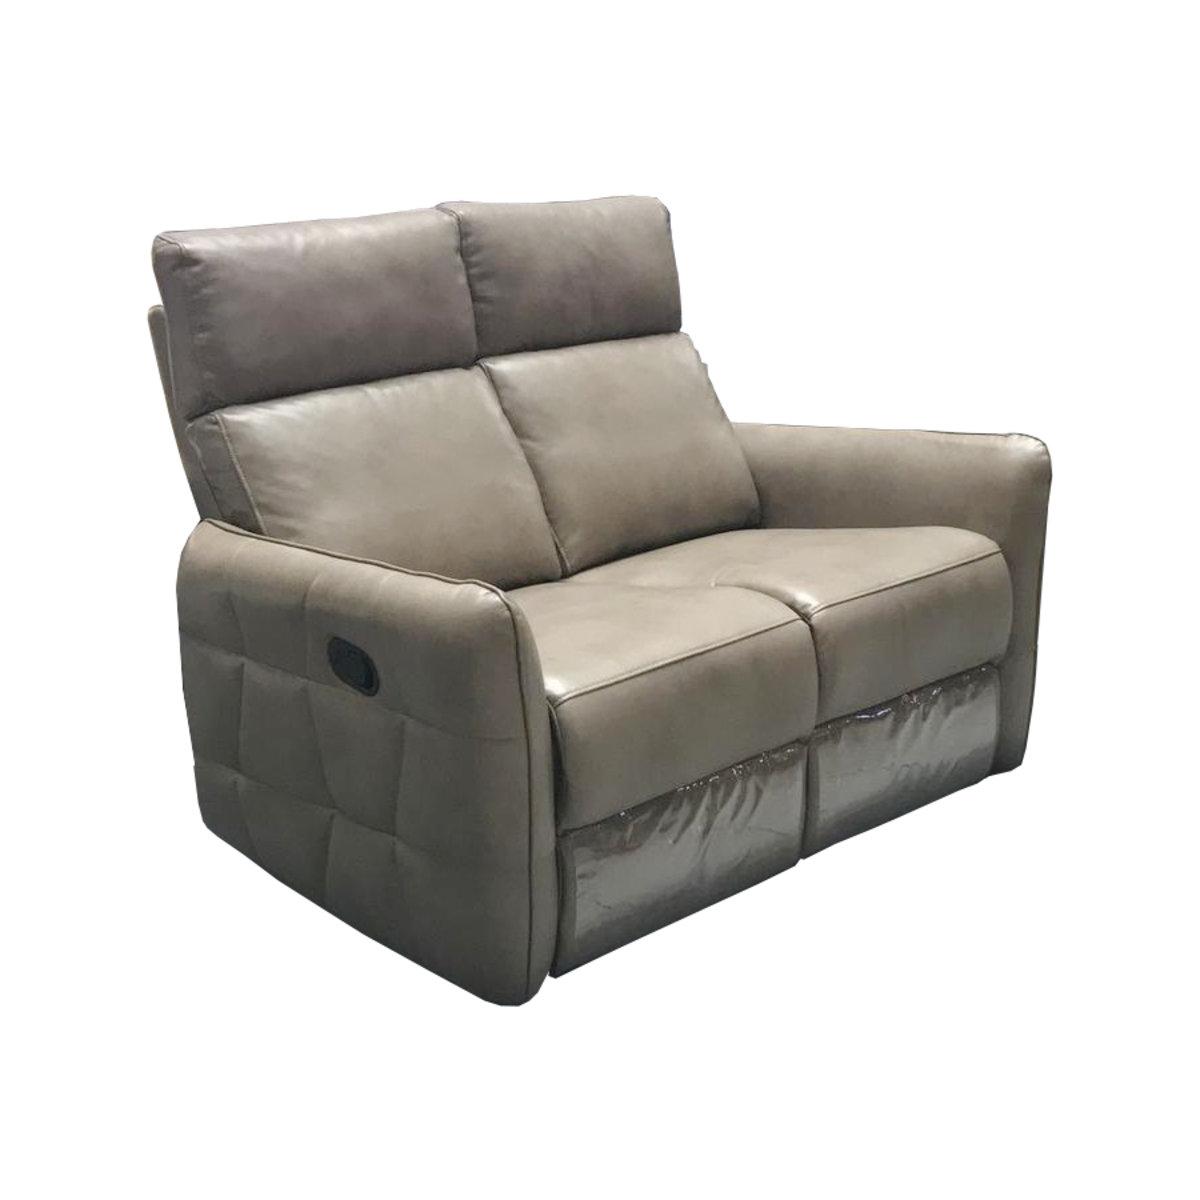 "54"" 2-Seat Air Leather Sofa"